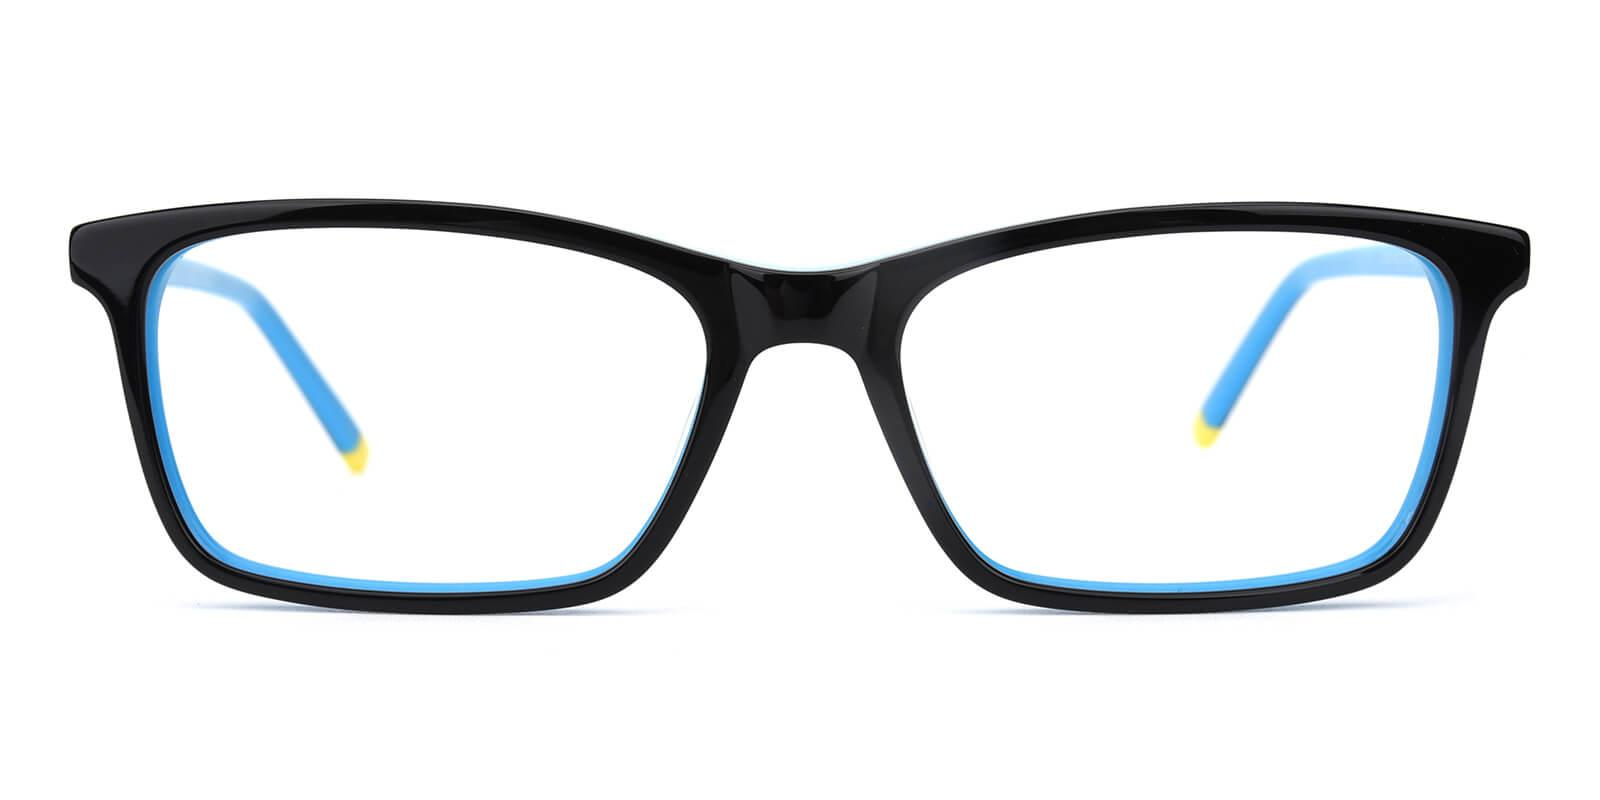 Crane-Blue-Rectangle-Acetate-Eyeglasses-additional2